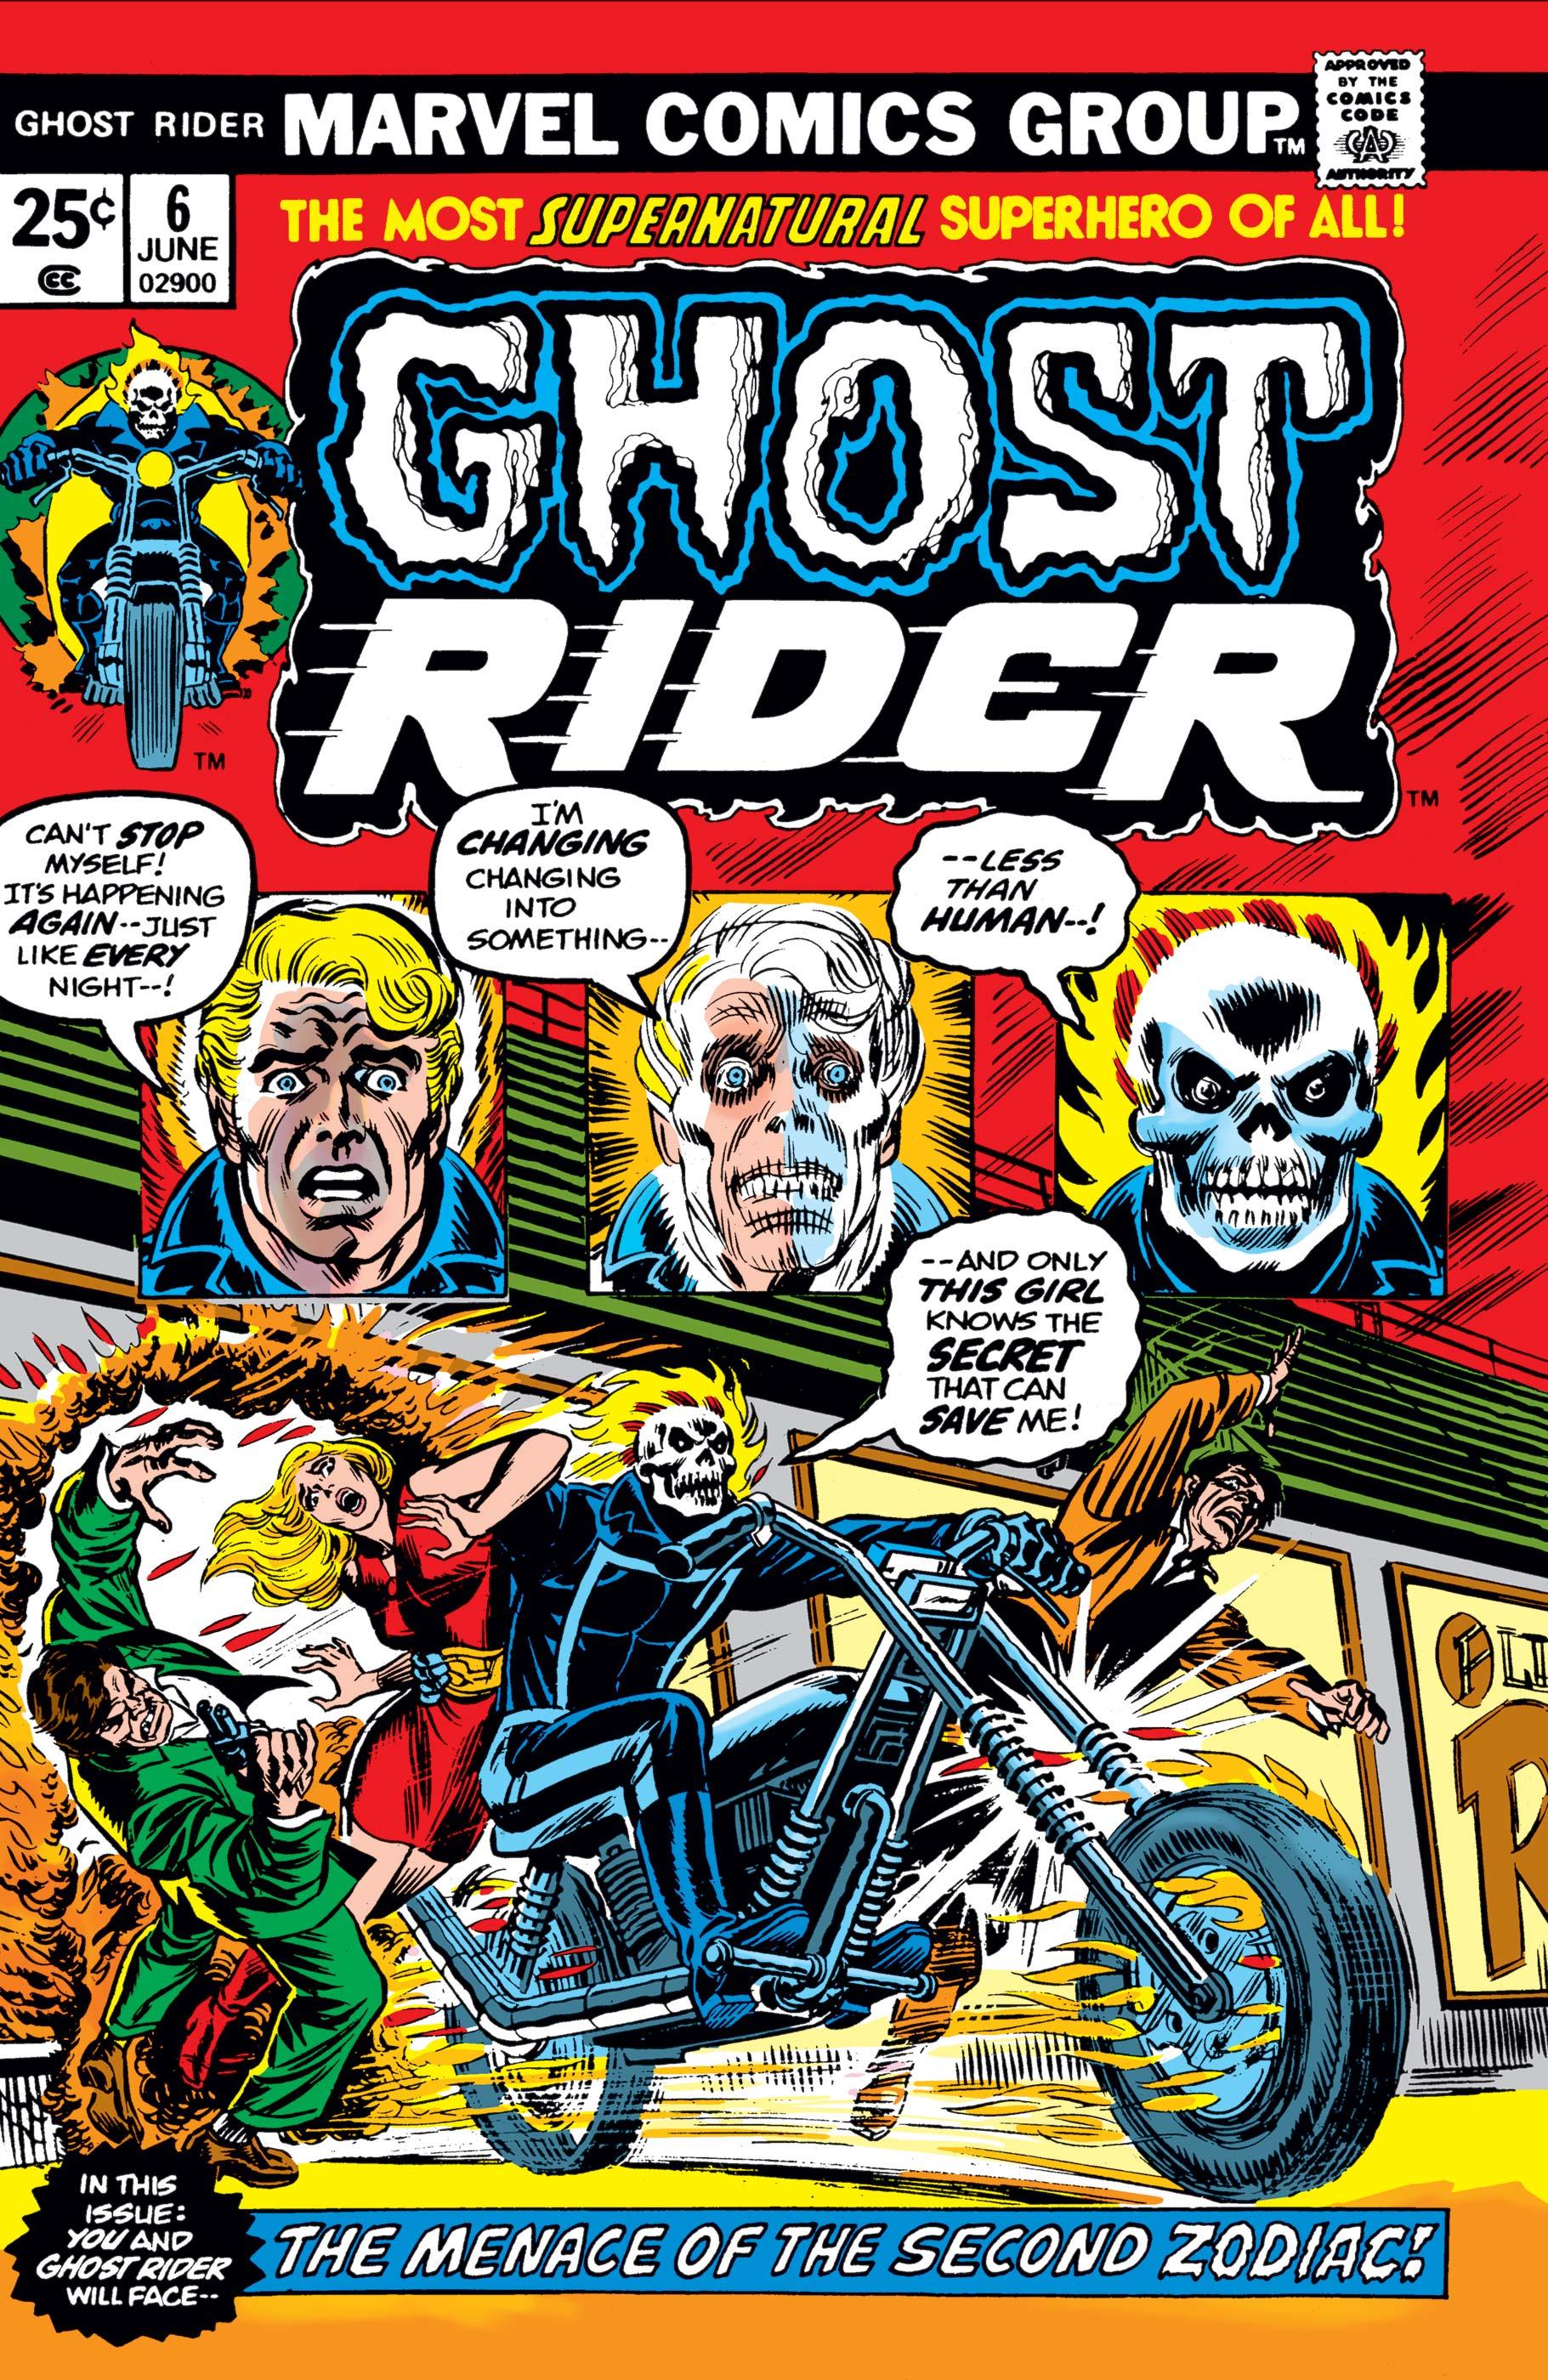 Ghost Rider (1973) #6